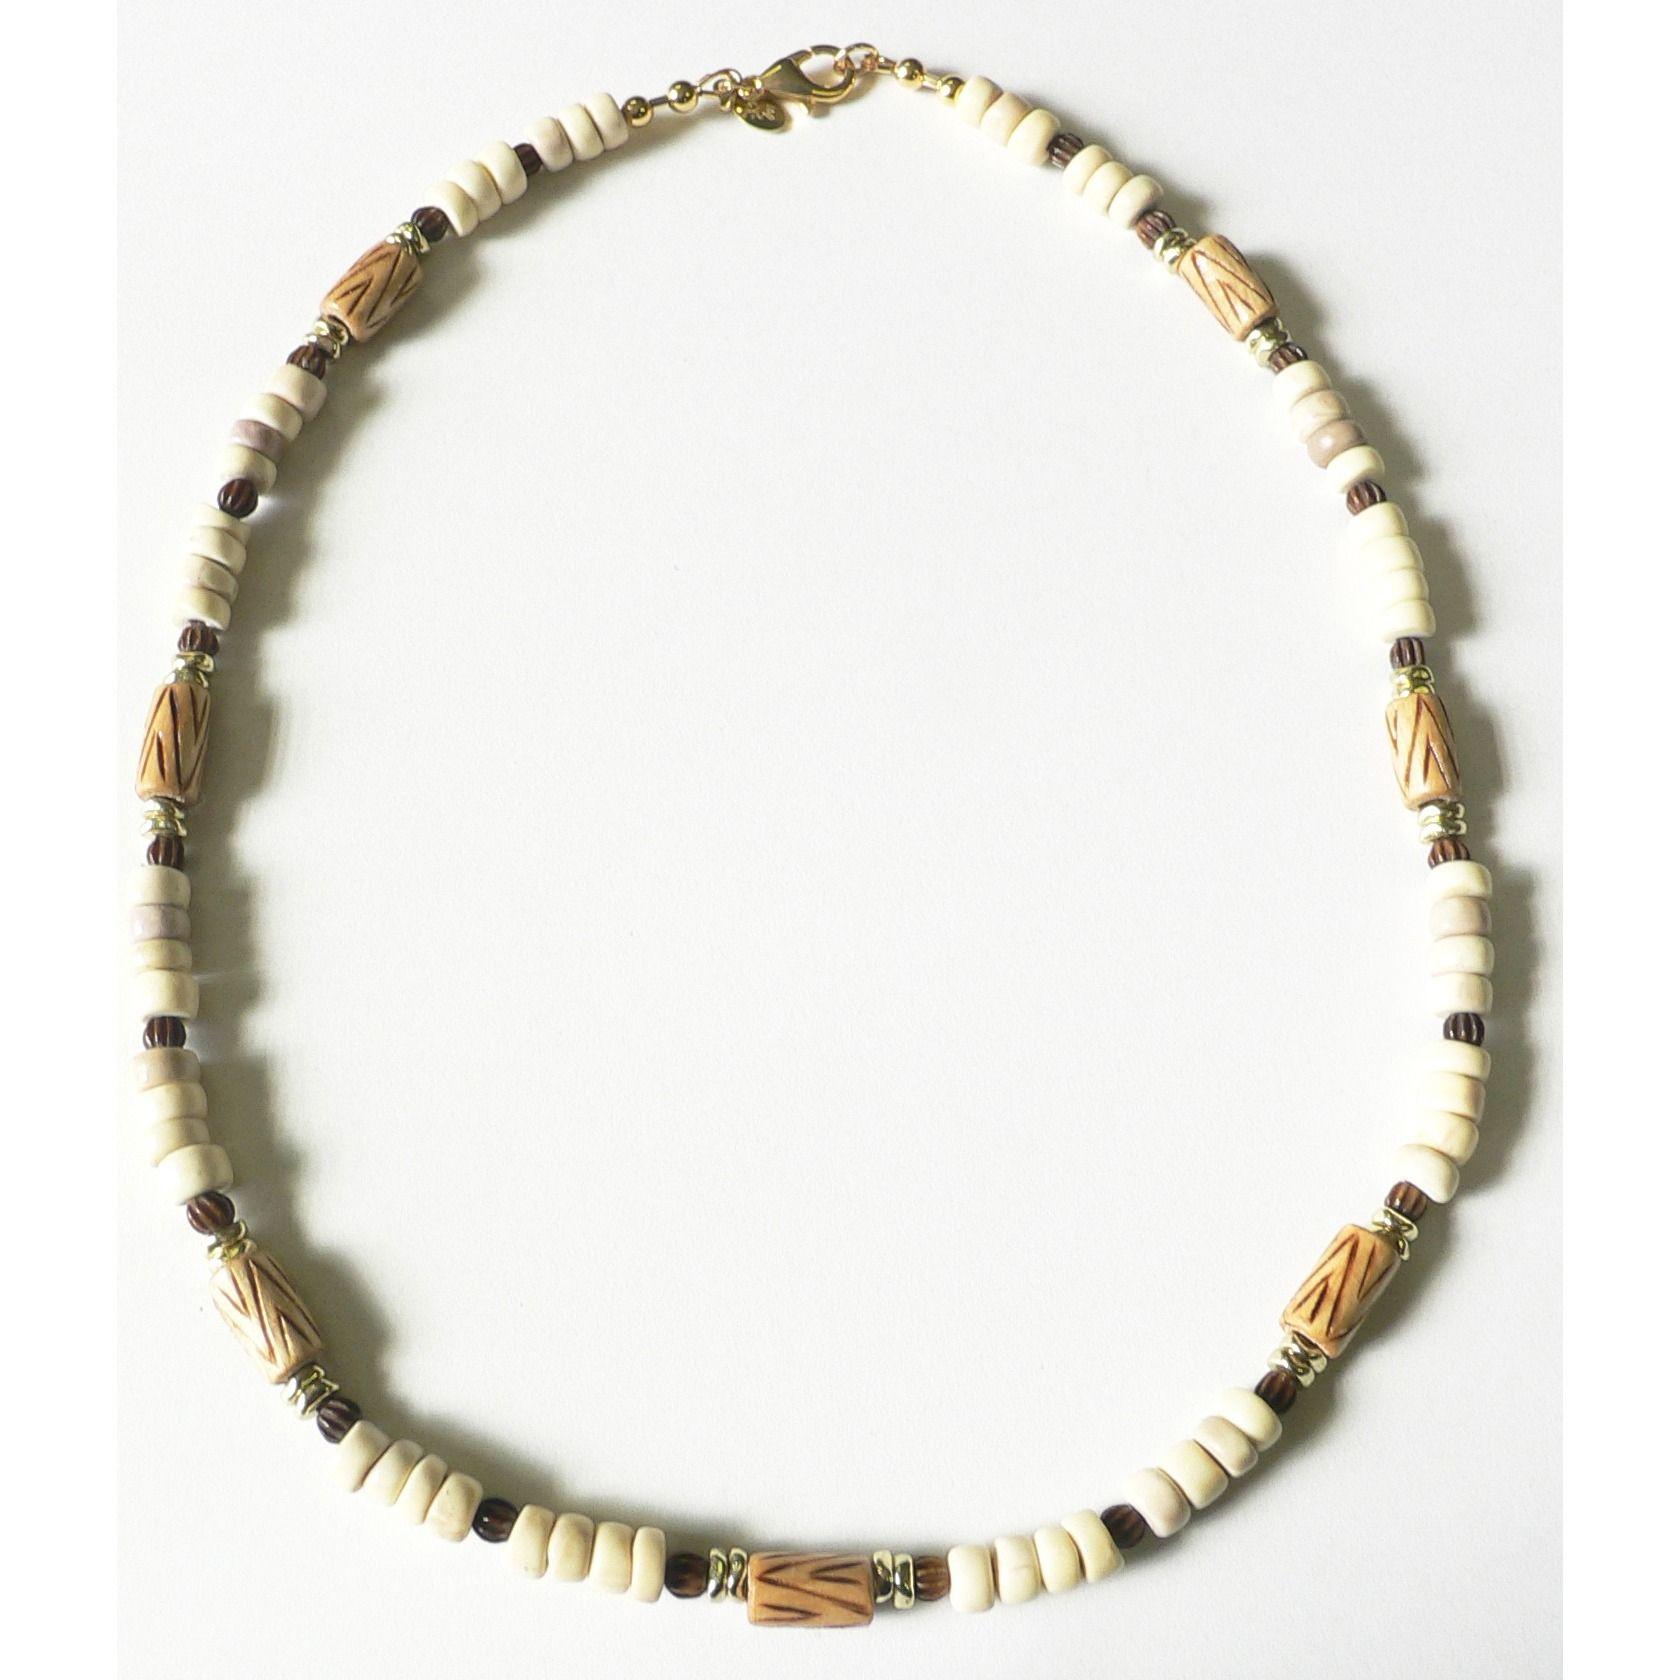 Palmtree gems uel caminou sea urchin wood and bone